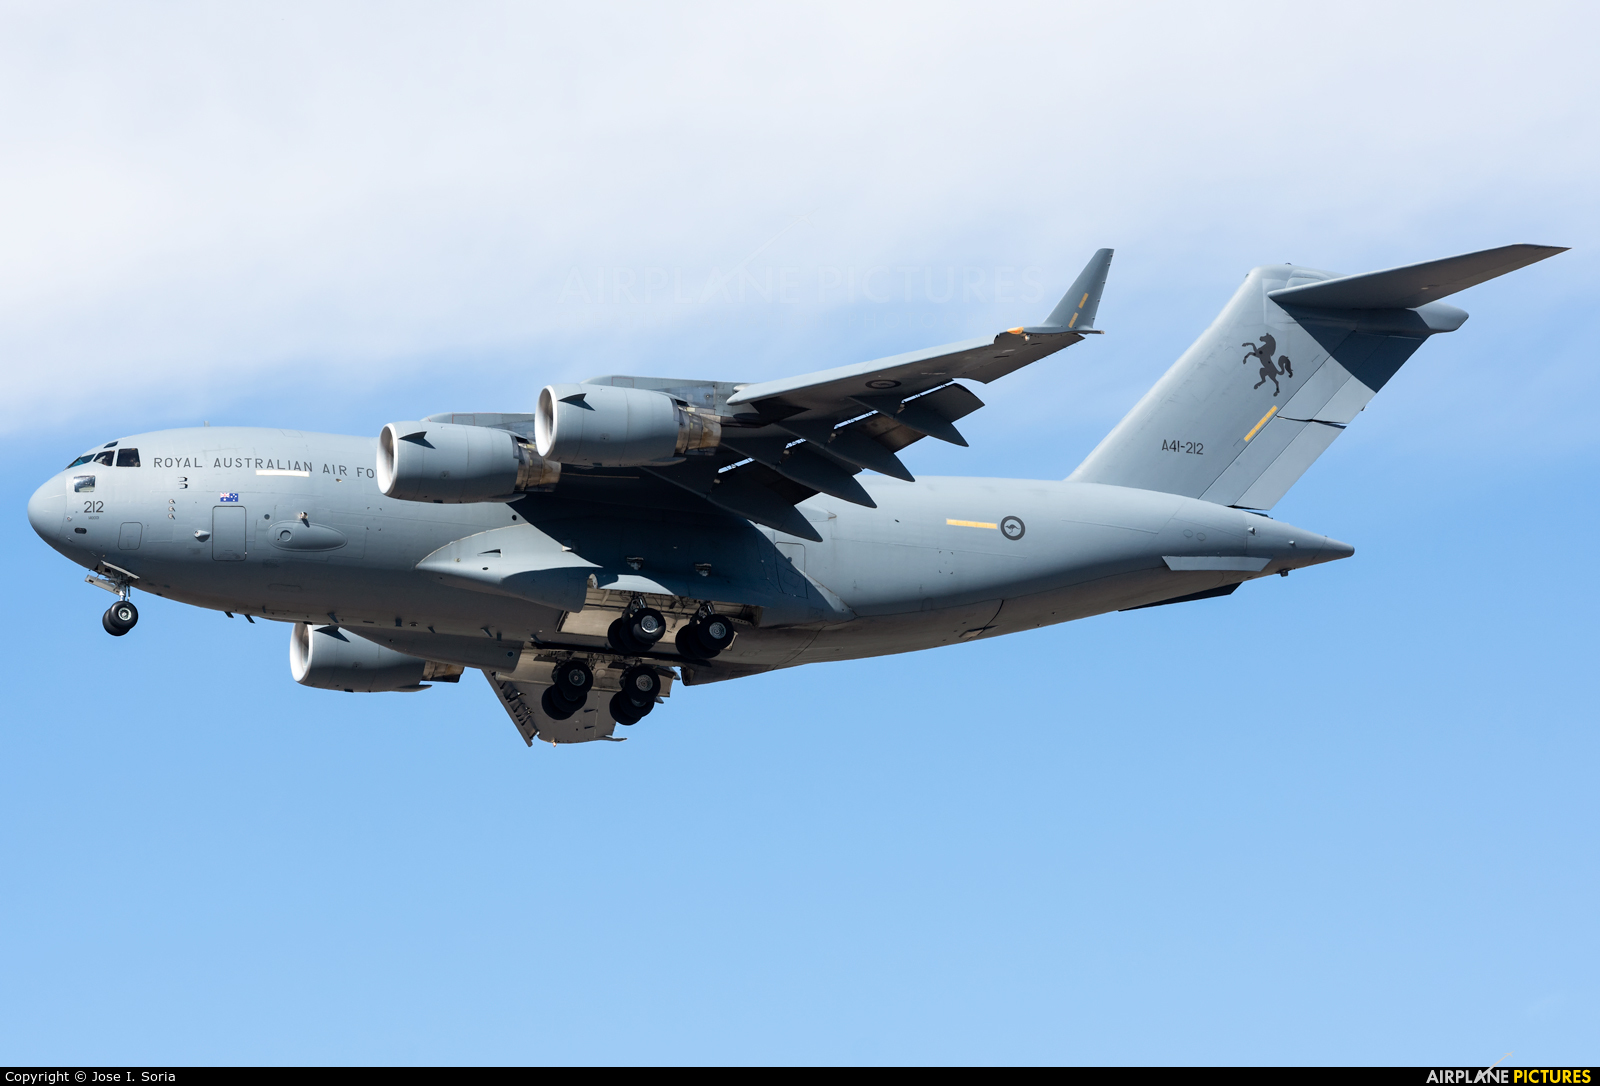 Australia - Air Force A41-212 aircraft at Madrid - Getafe